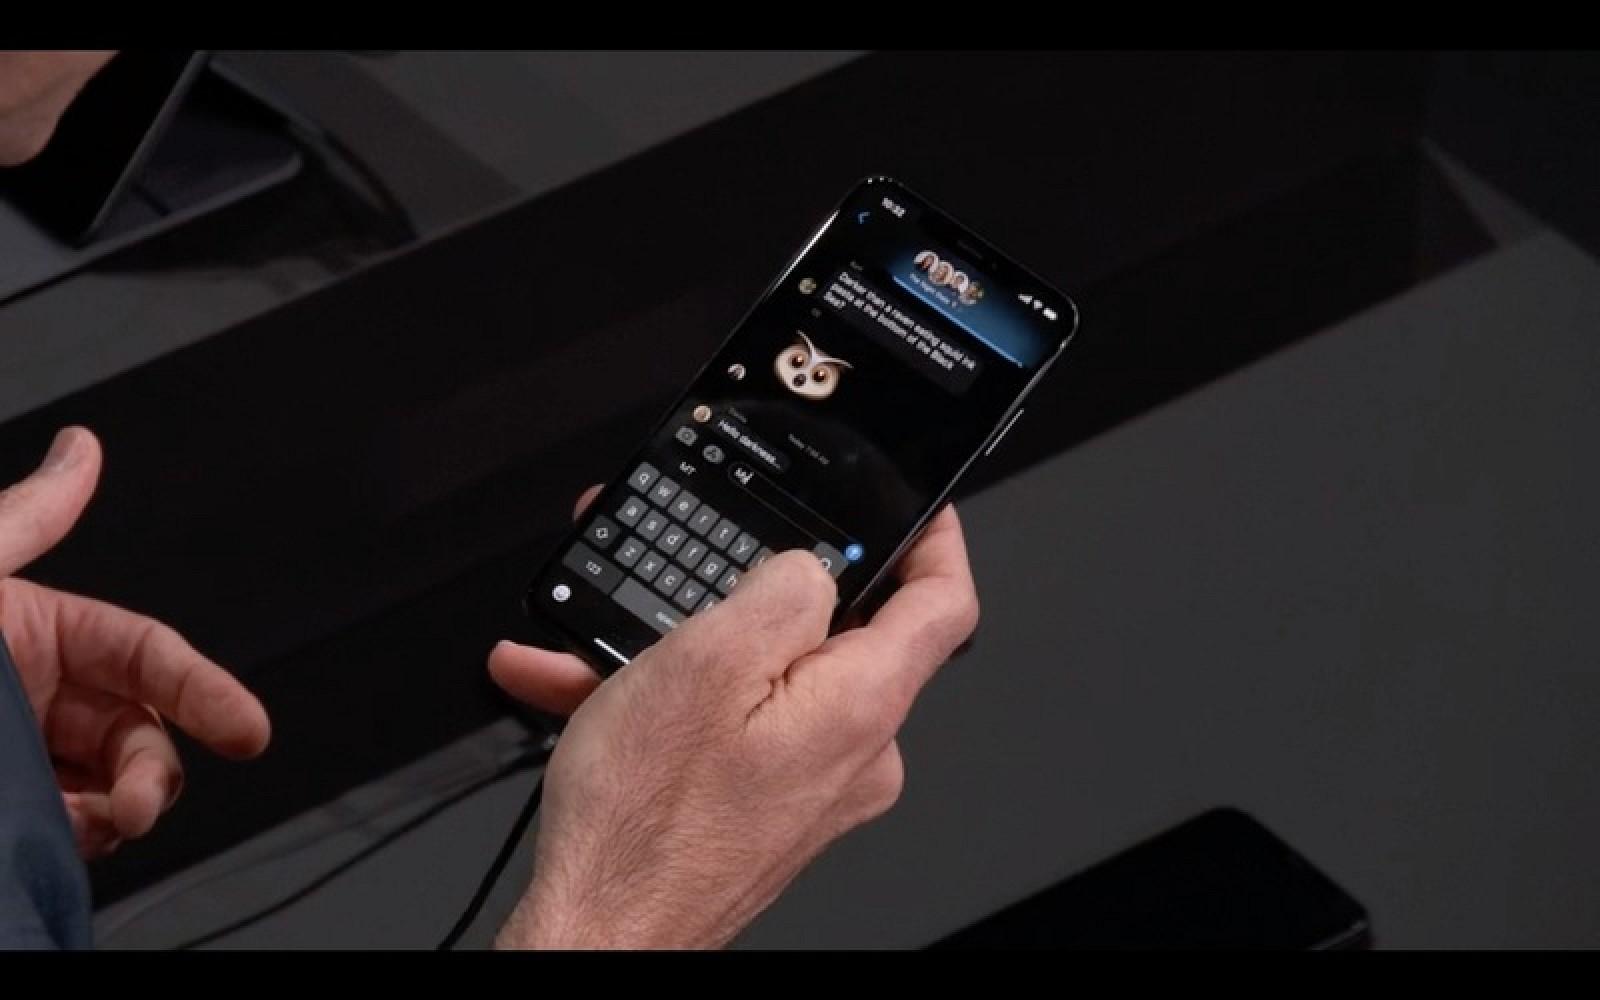 acd036eda24 Apple Adding Swipe Keyboard Named QuickPath to iPhone and iPad - MacRumors